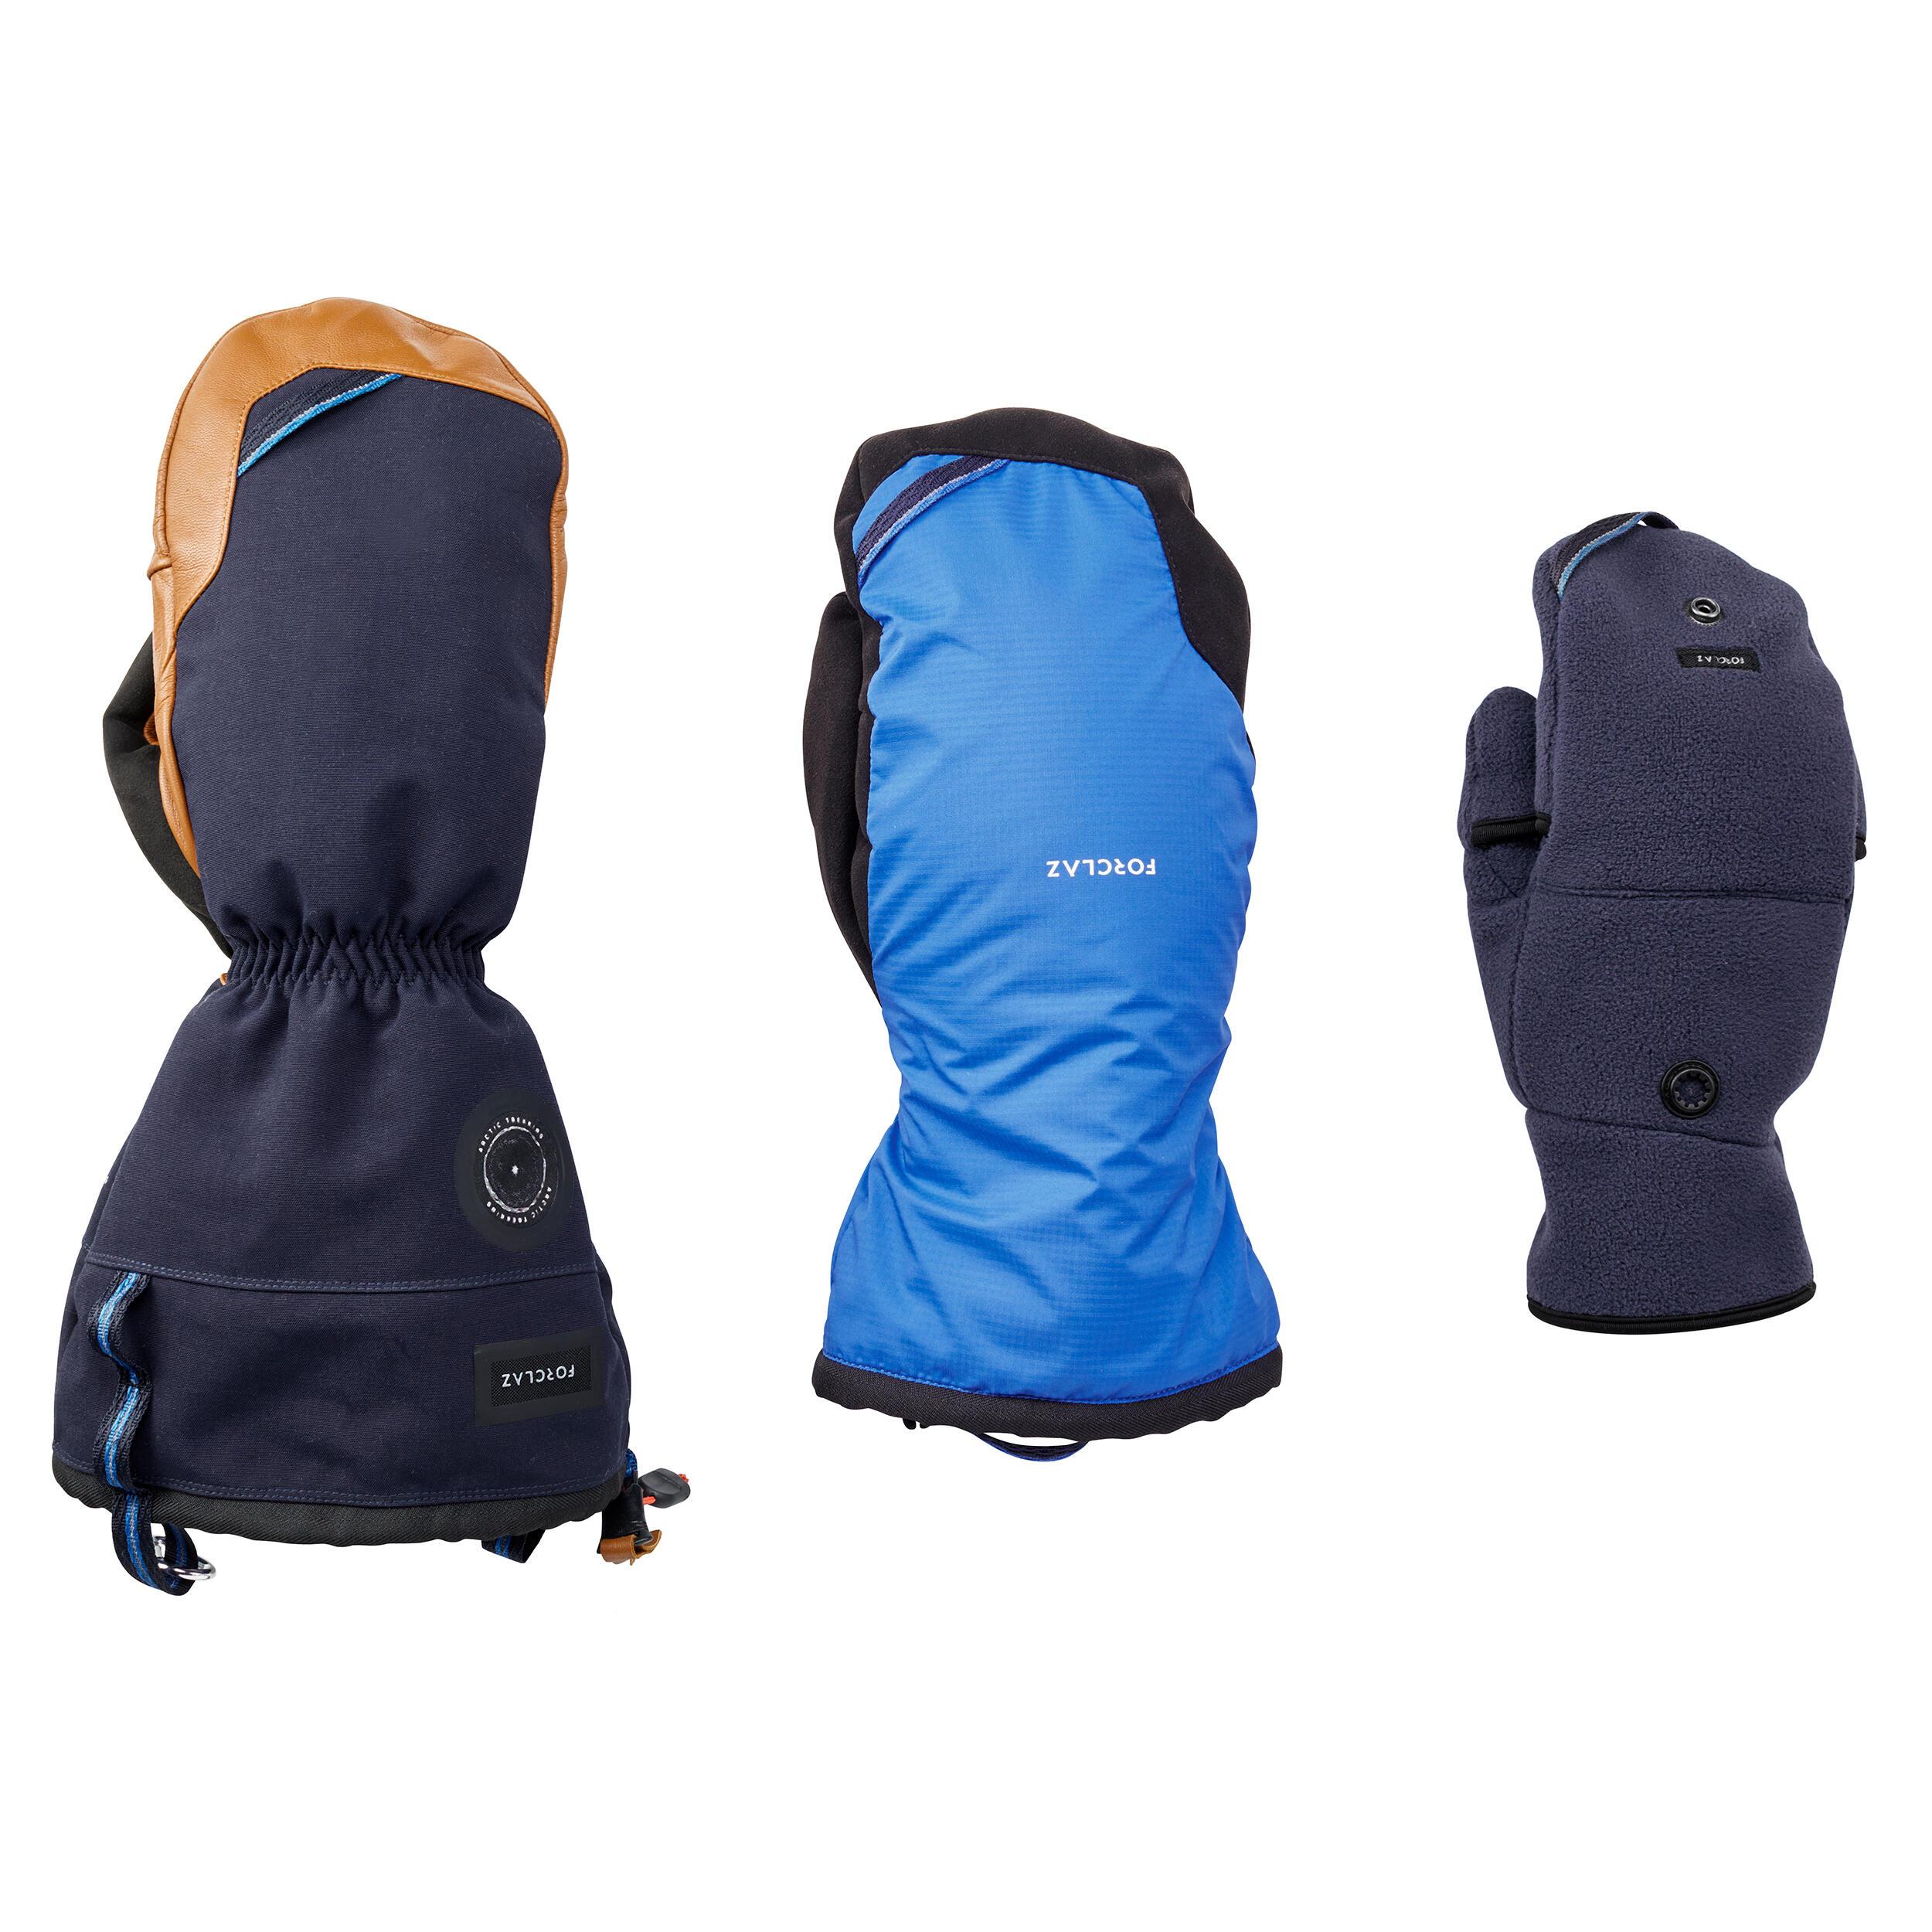 Fäustlinge Arctic Trekking MITT 500 | Accessoires > Handschuhe > Fäustlinge | Forclaz